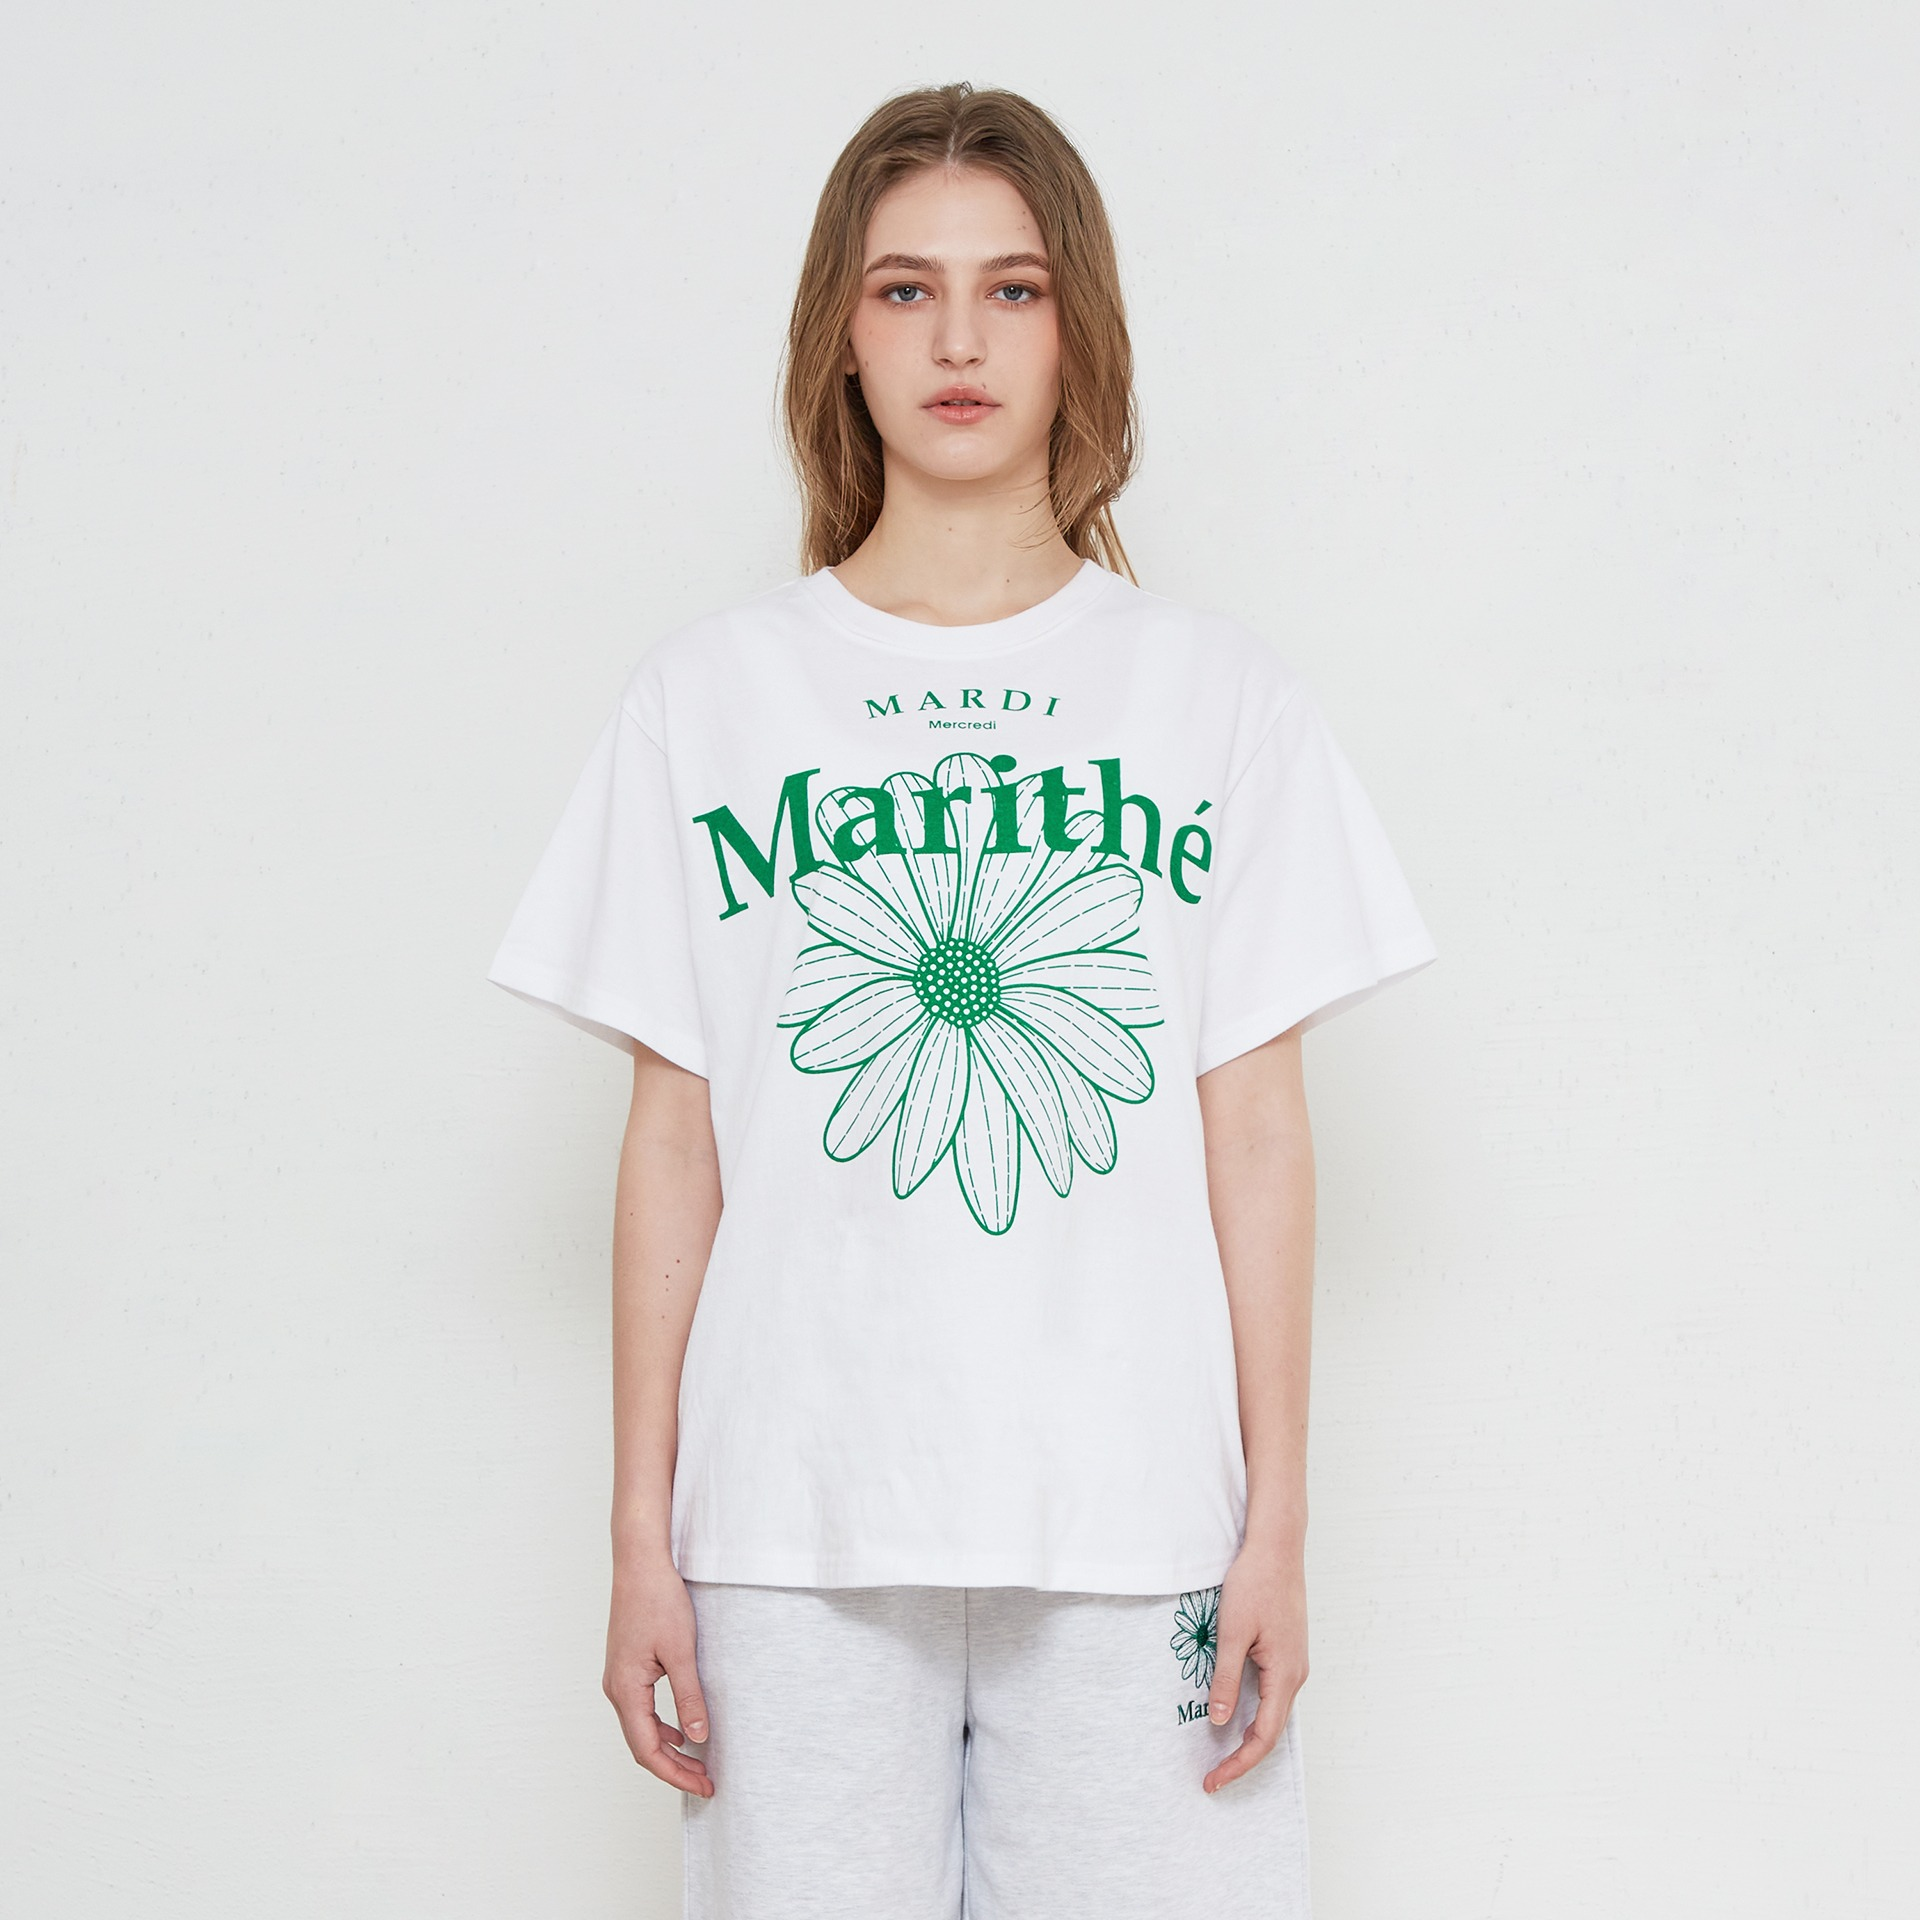 layer-MARITHE X MARDI MERCREDI GRAPHIC TEE white♡韓國男裝上衣